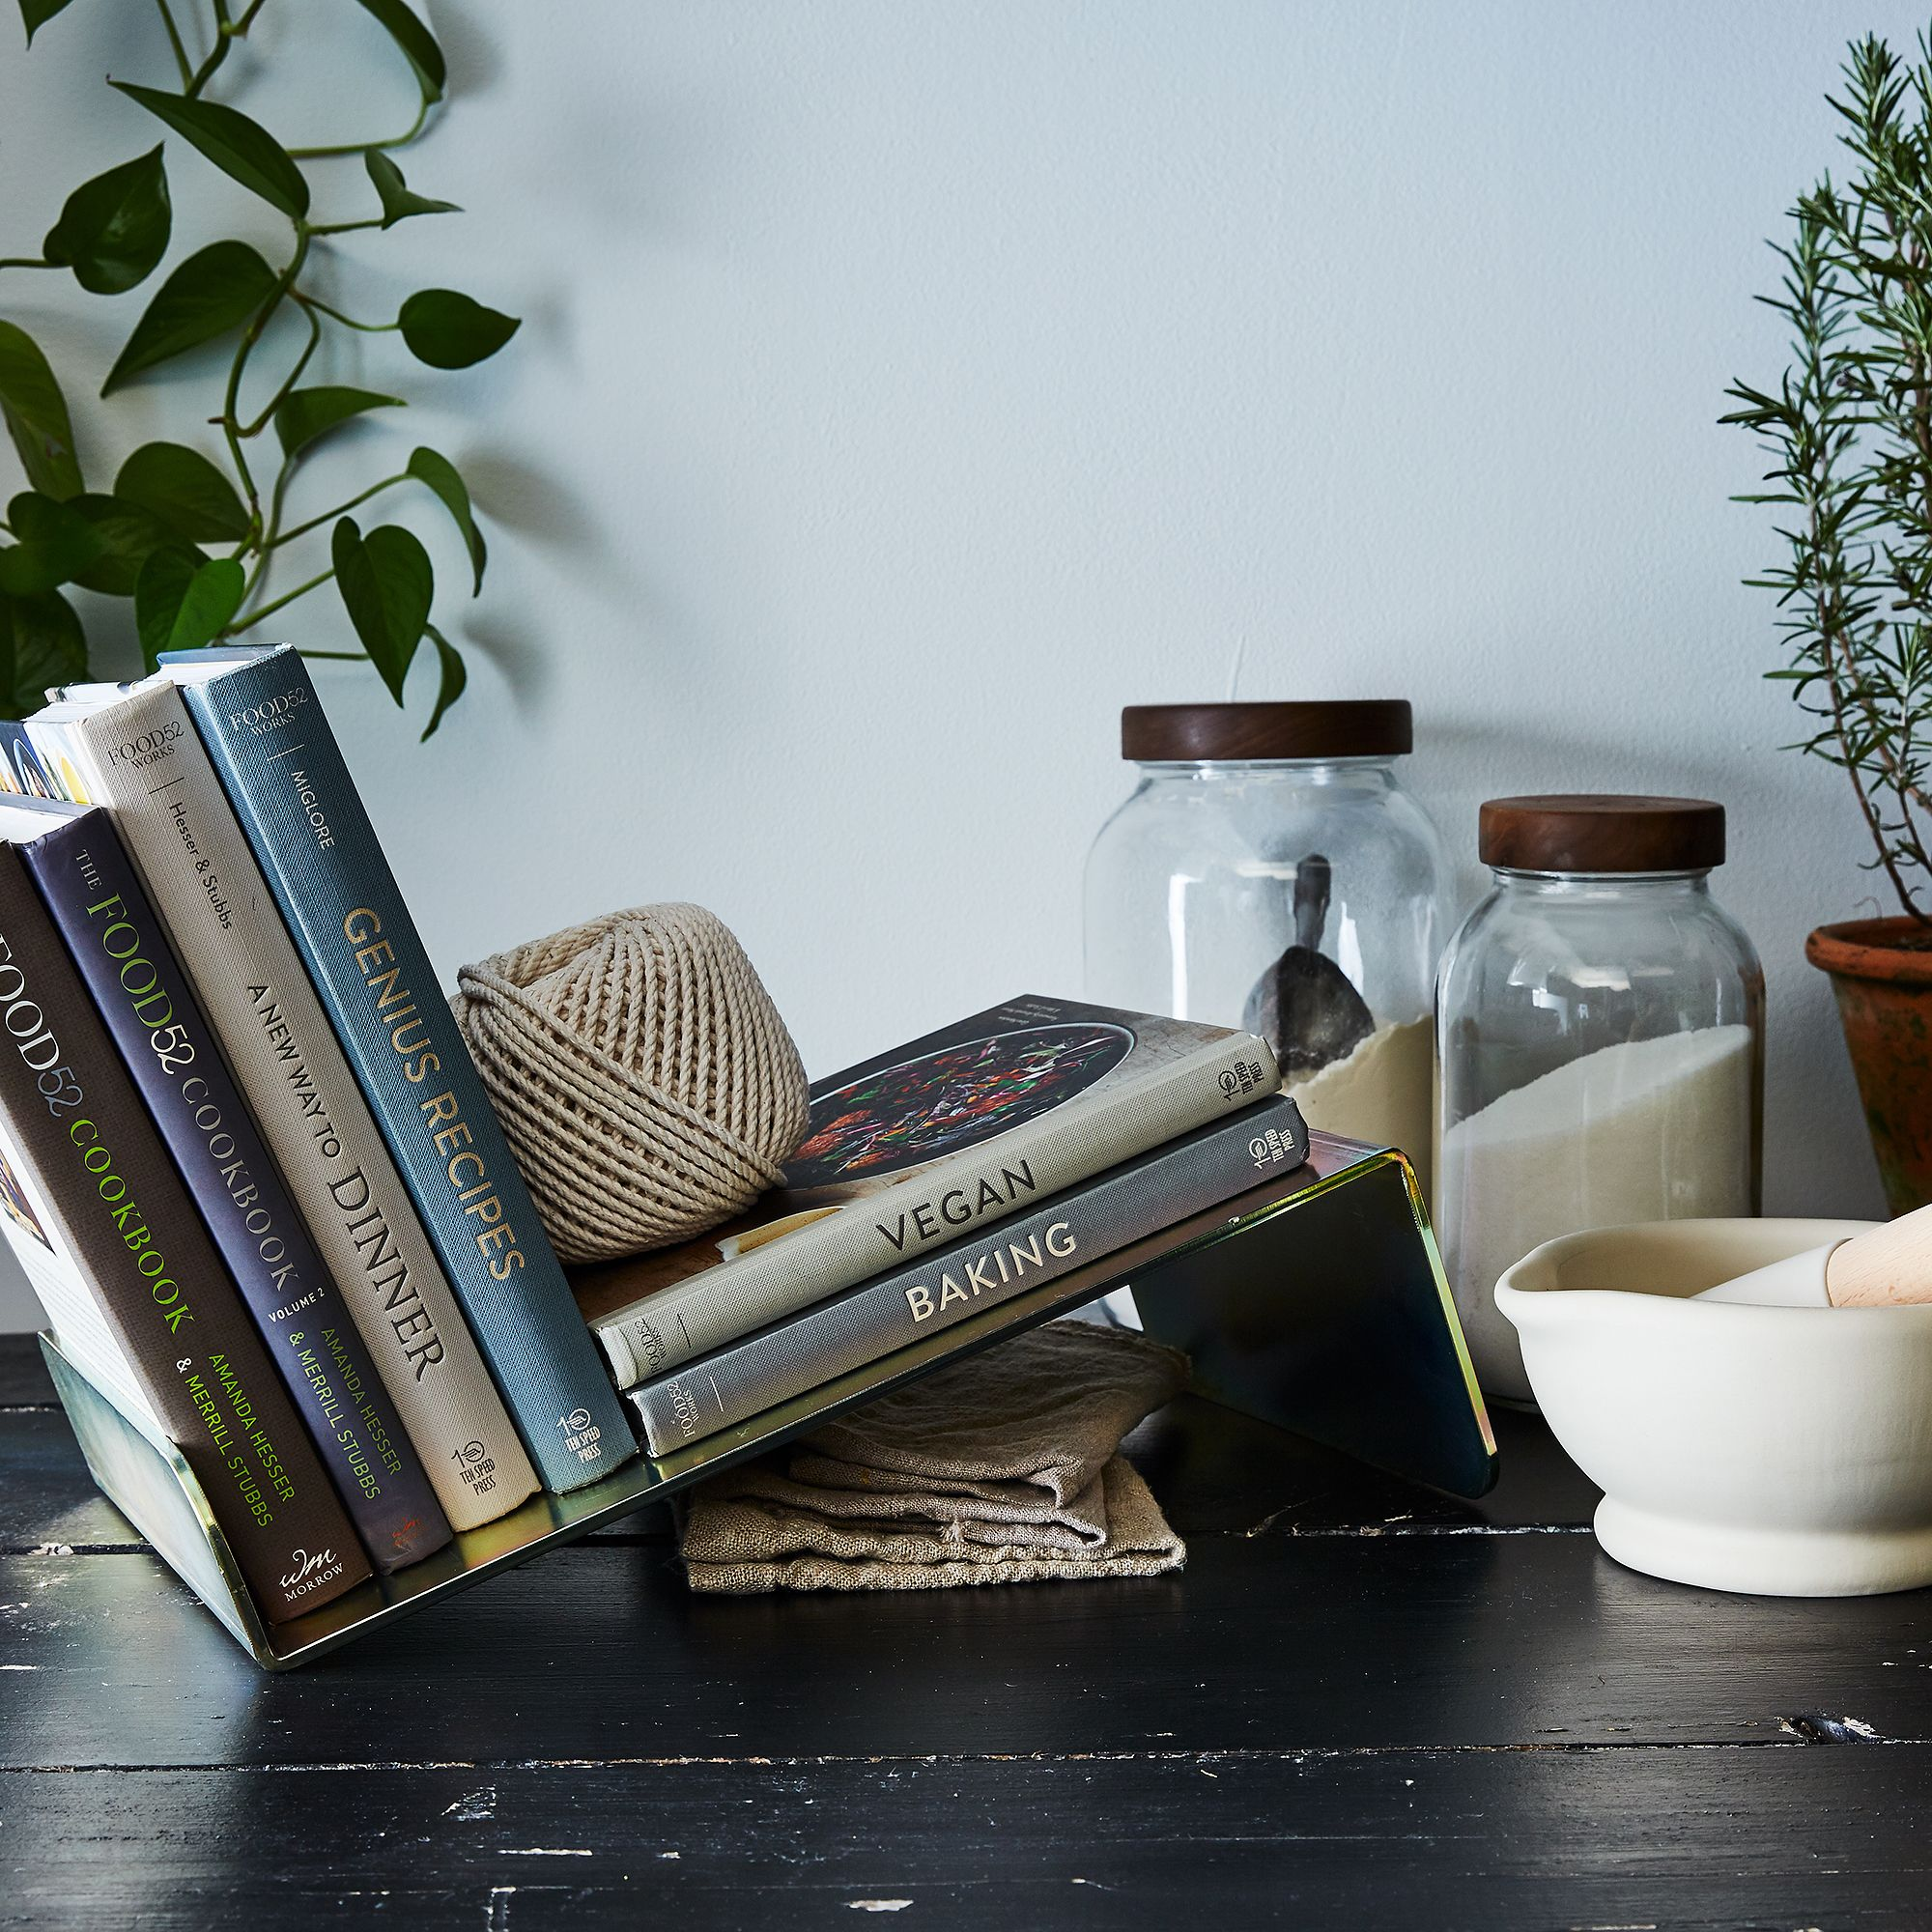 Book Display Shelf by Base Modern $150